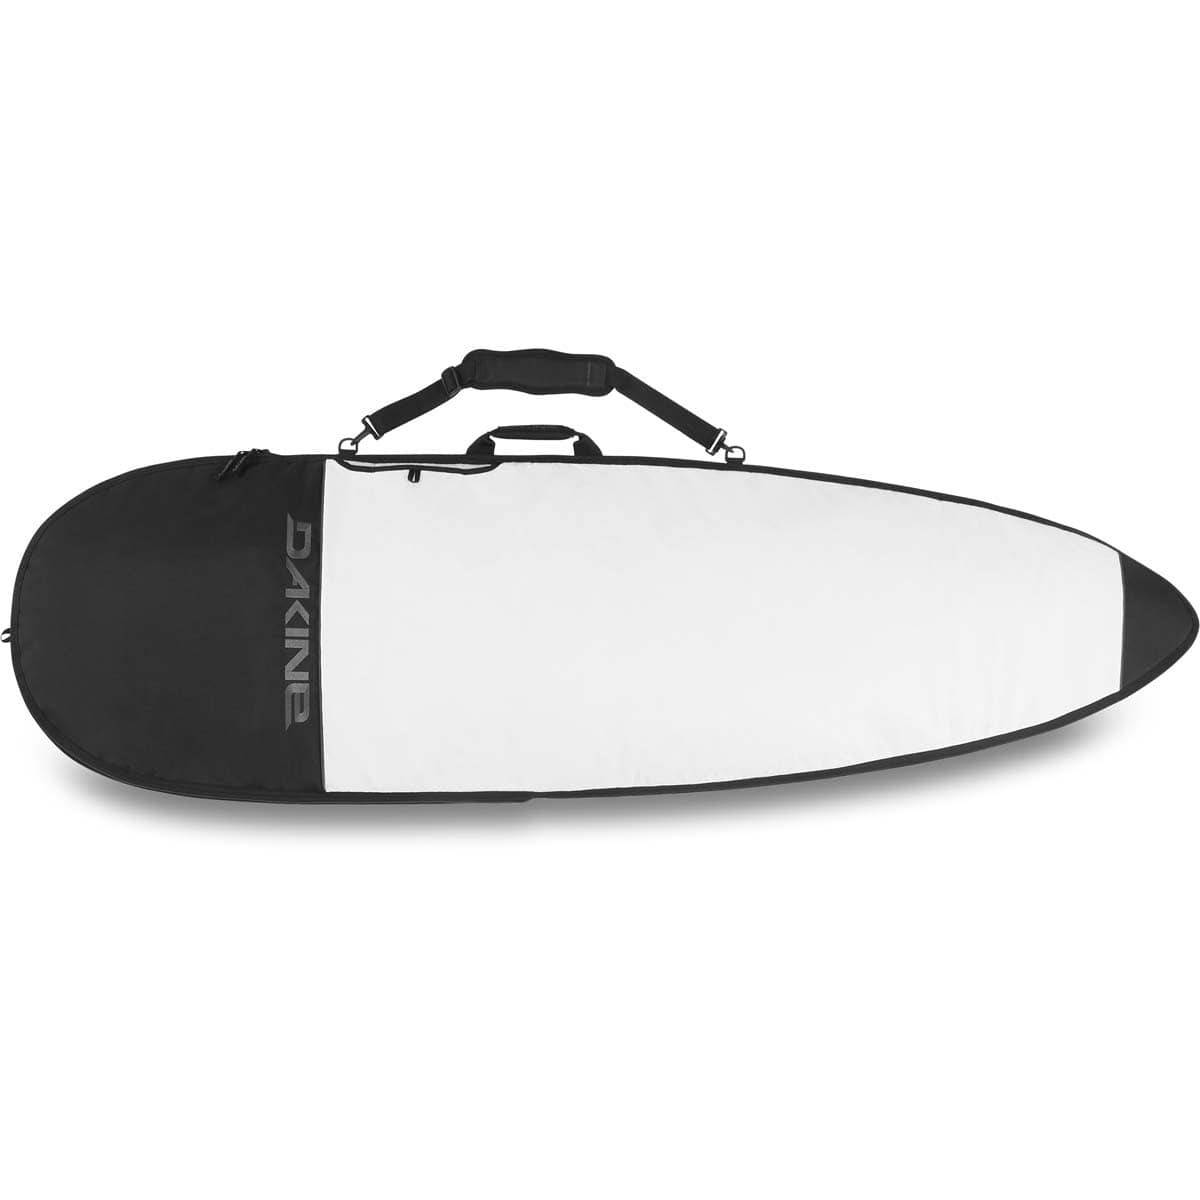 Dakine Daylight Surfboard Bag Thruster 5'4'' Surf Boardbag White